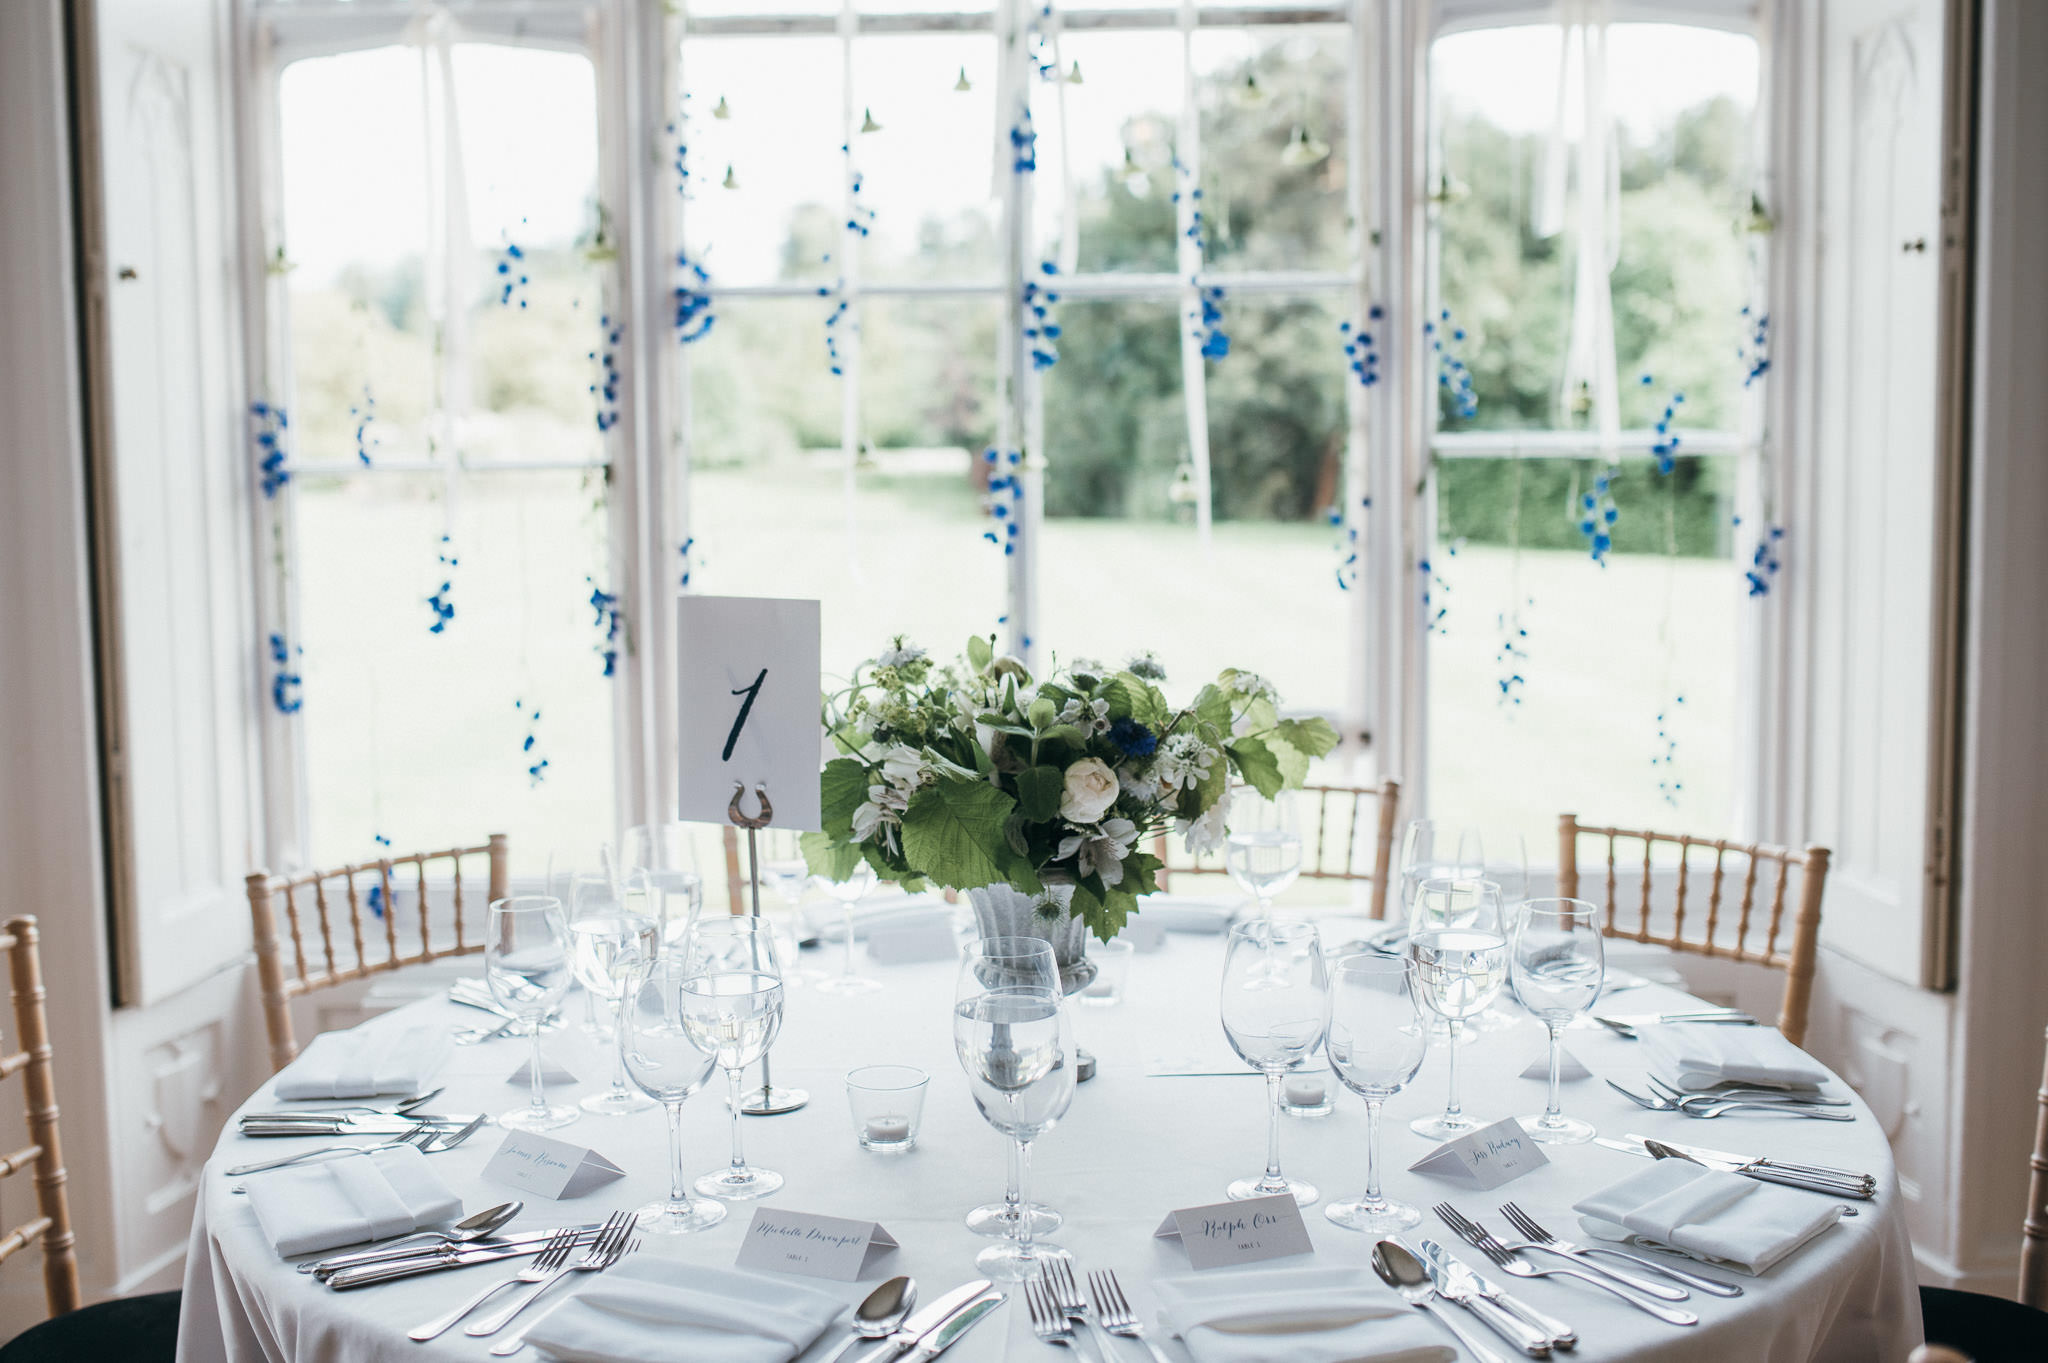 Nonsuch wedding venue simon biffen photography 6